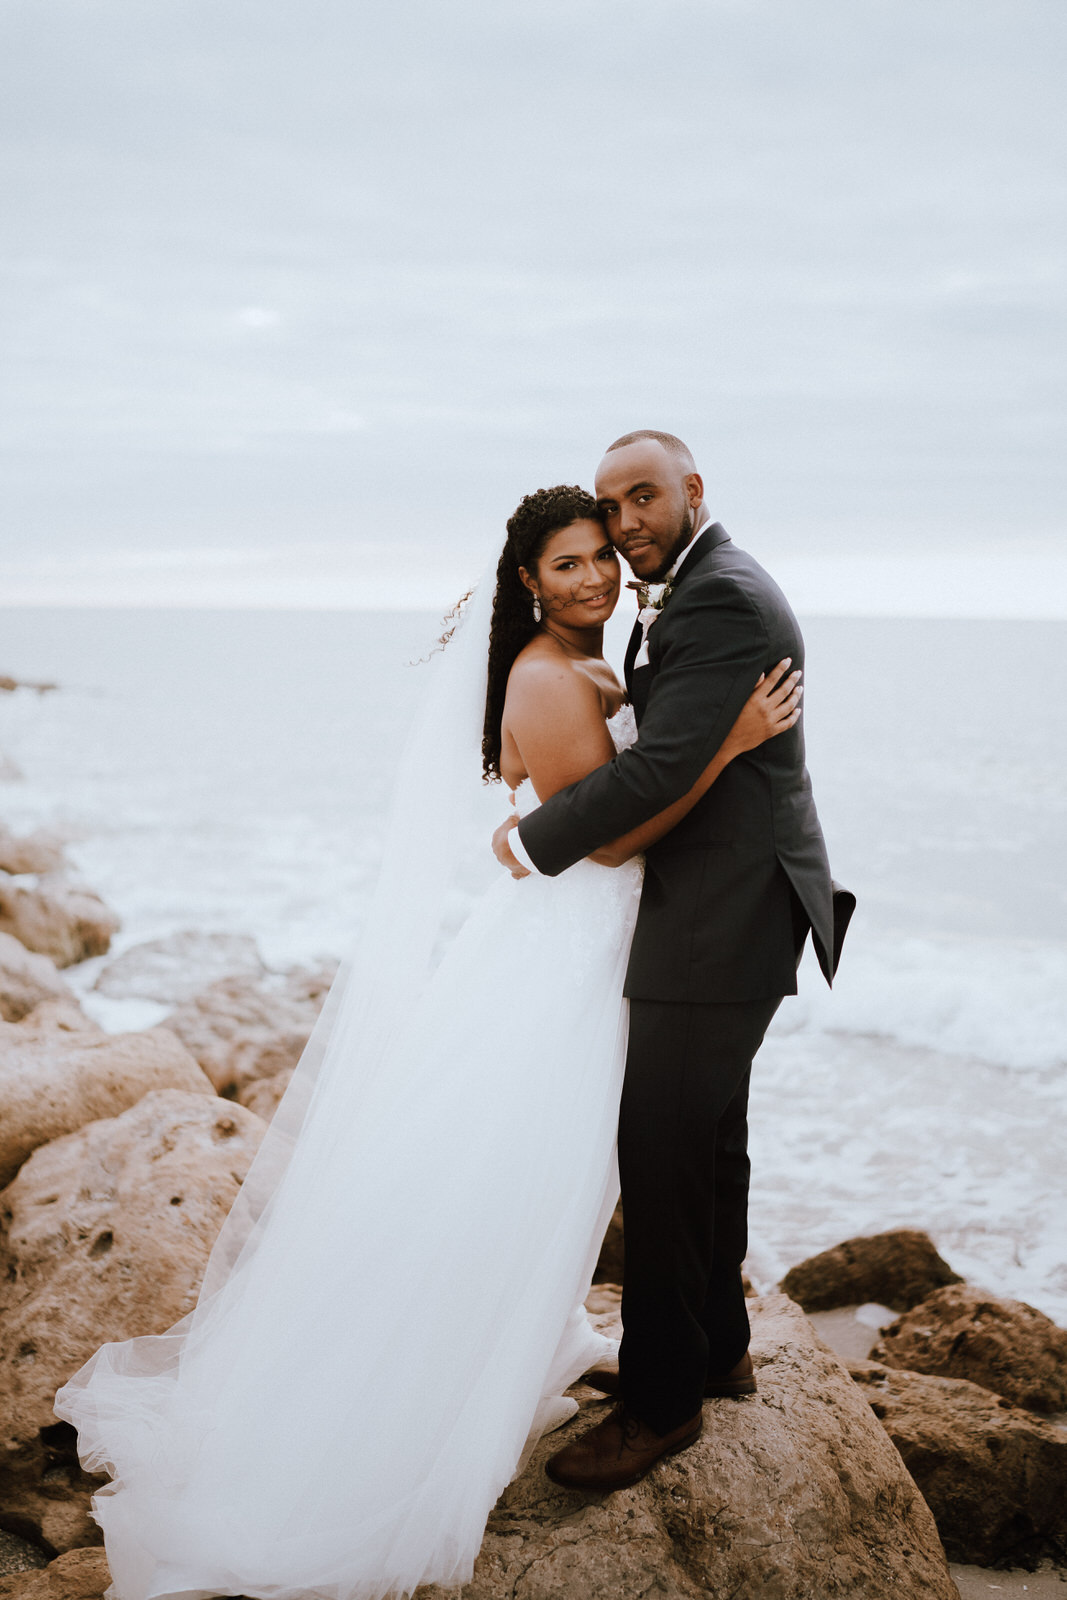 South Seas Island Resort Elopement- Alyana and Shawn- Michelle Gonzalez Photography-547.JPG